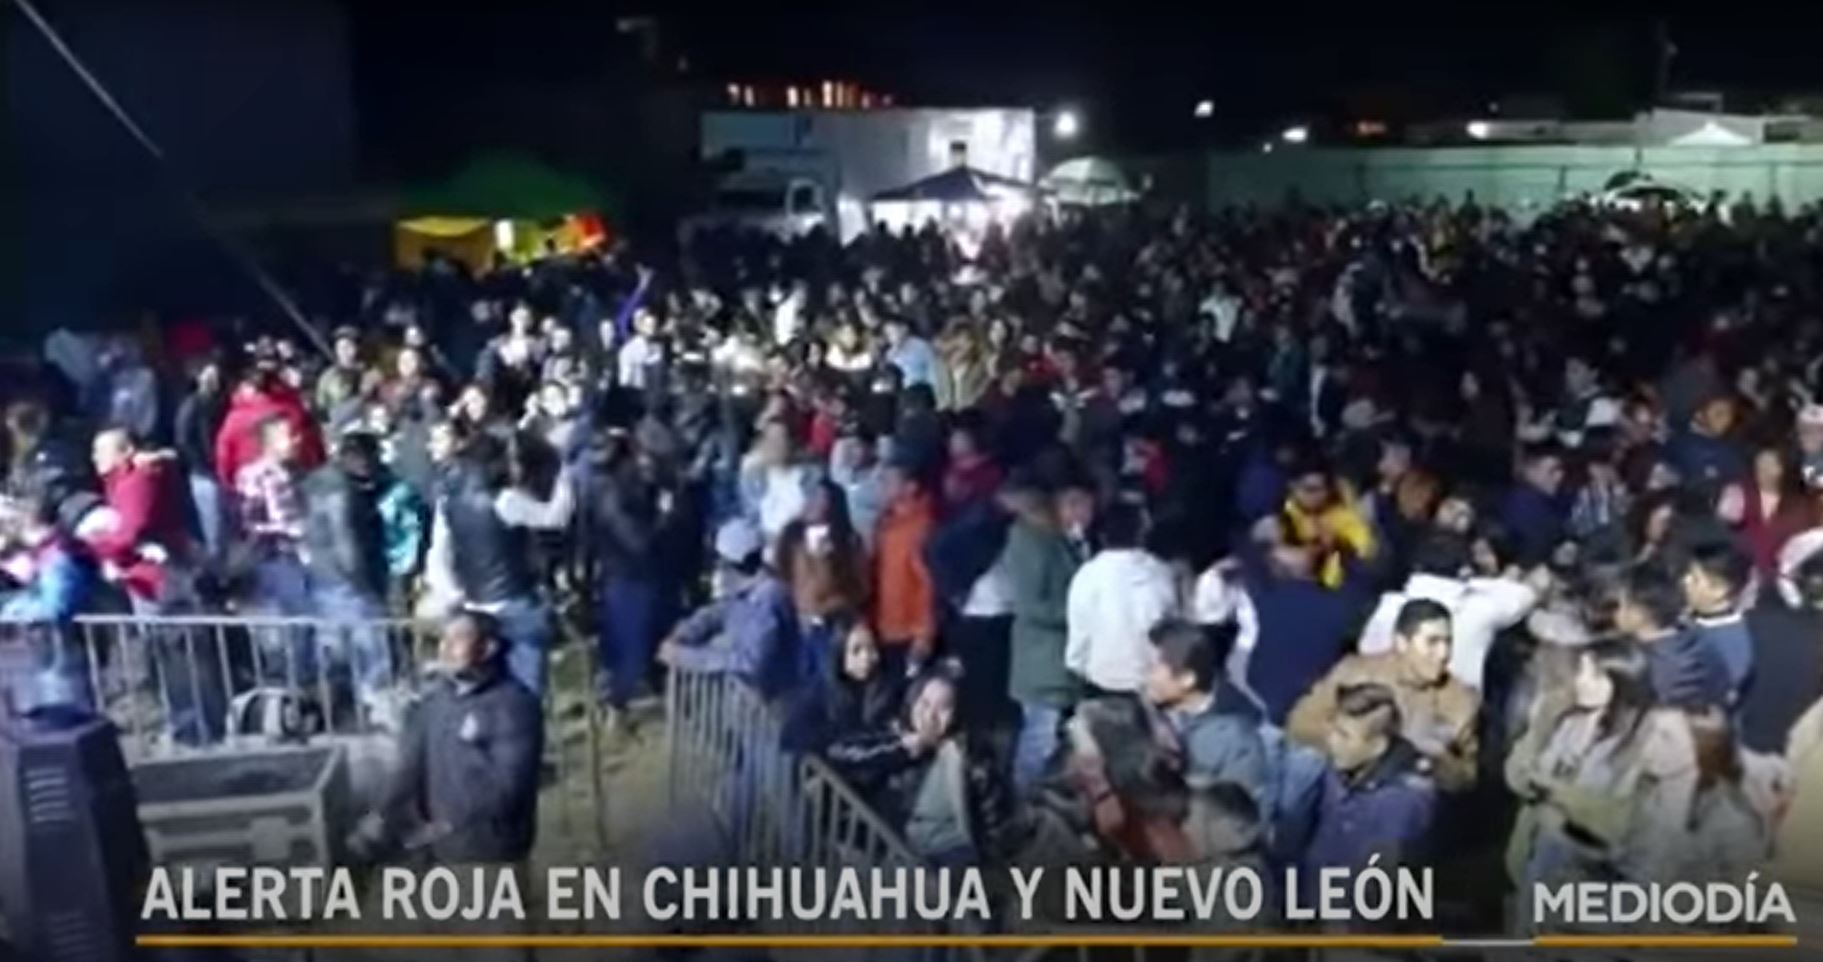 Toluca: Baile de San Andrés Cuexcontitlán se vuelve noticia internacional